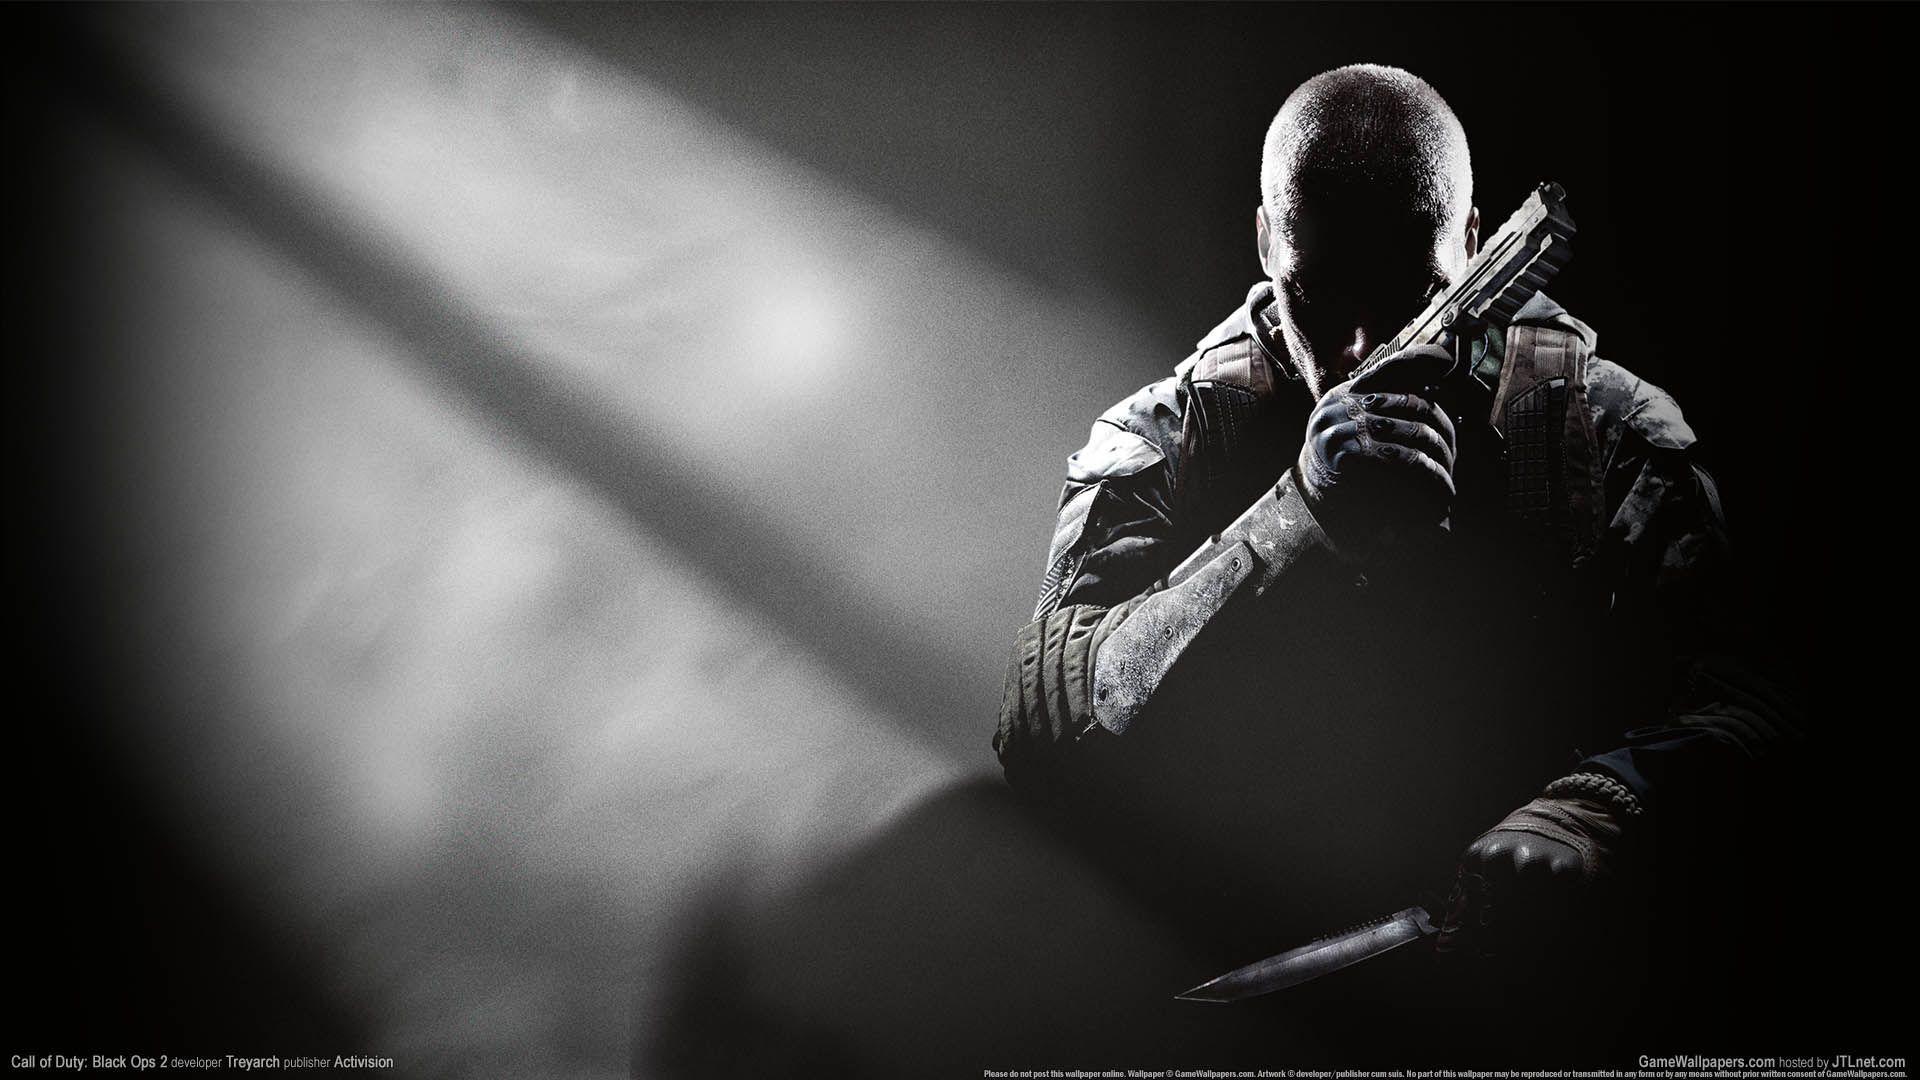 "1920x1080 Full Hd Of Call Duty Black Ops Or Desktop 2 Wallpaper Images Laptop ..."">"